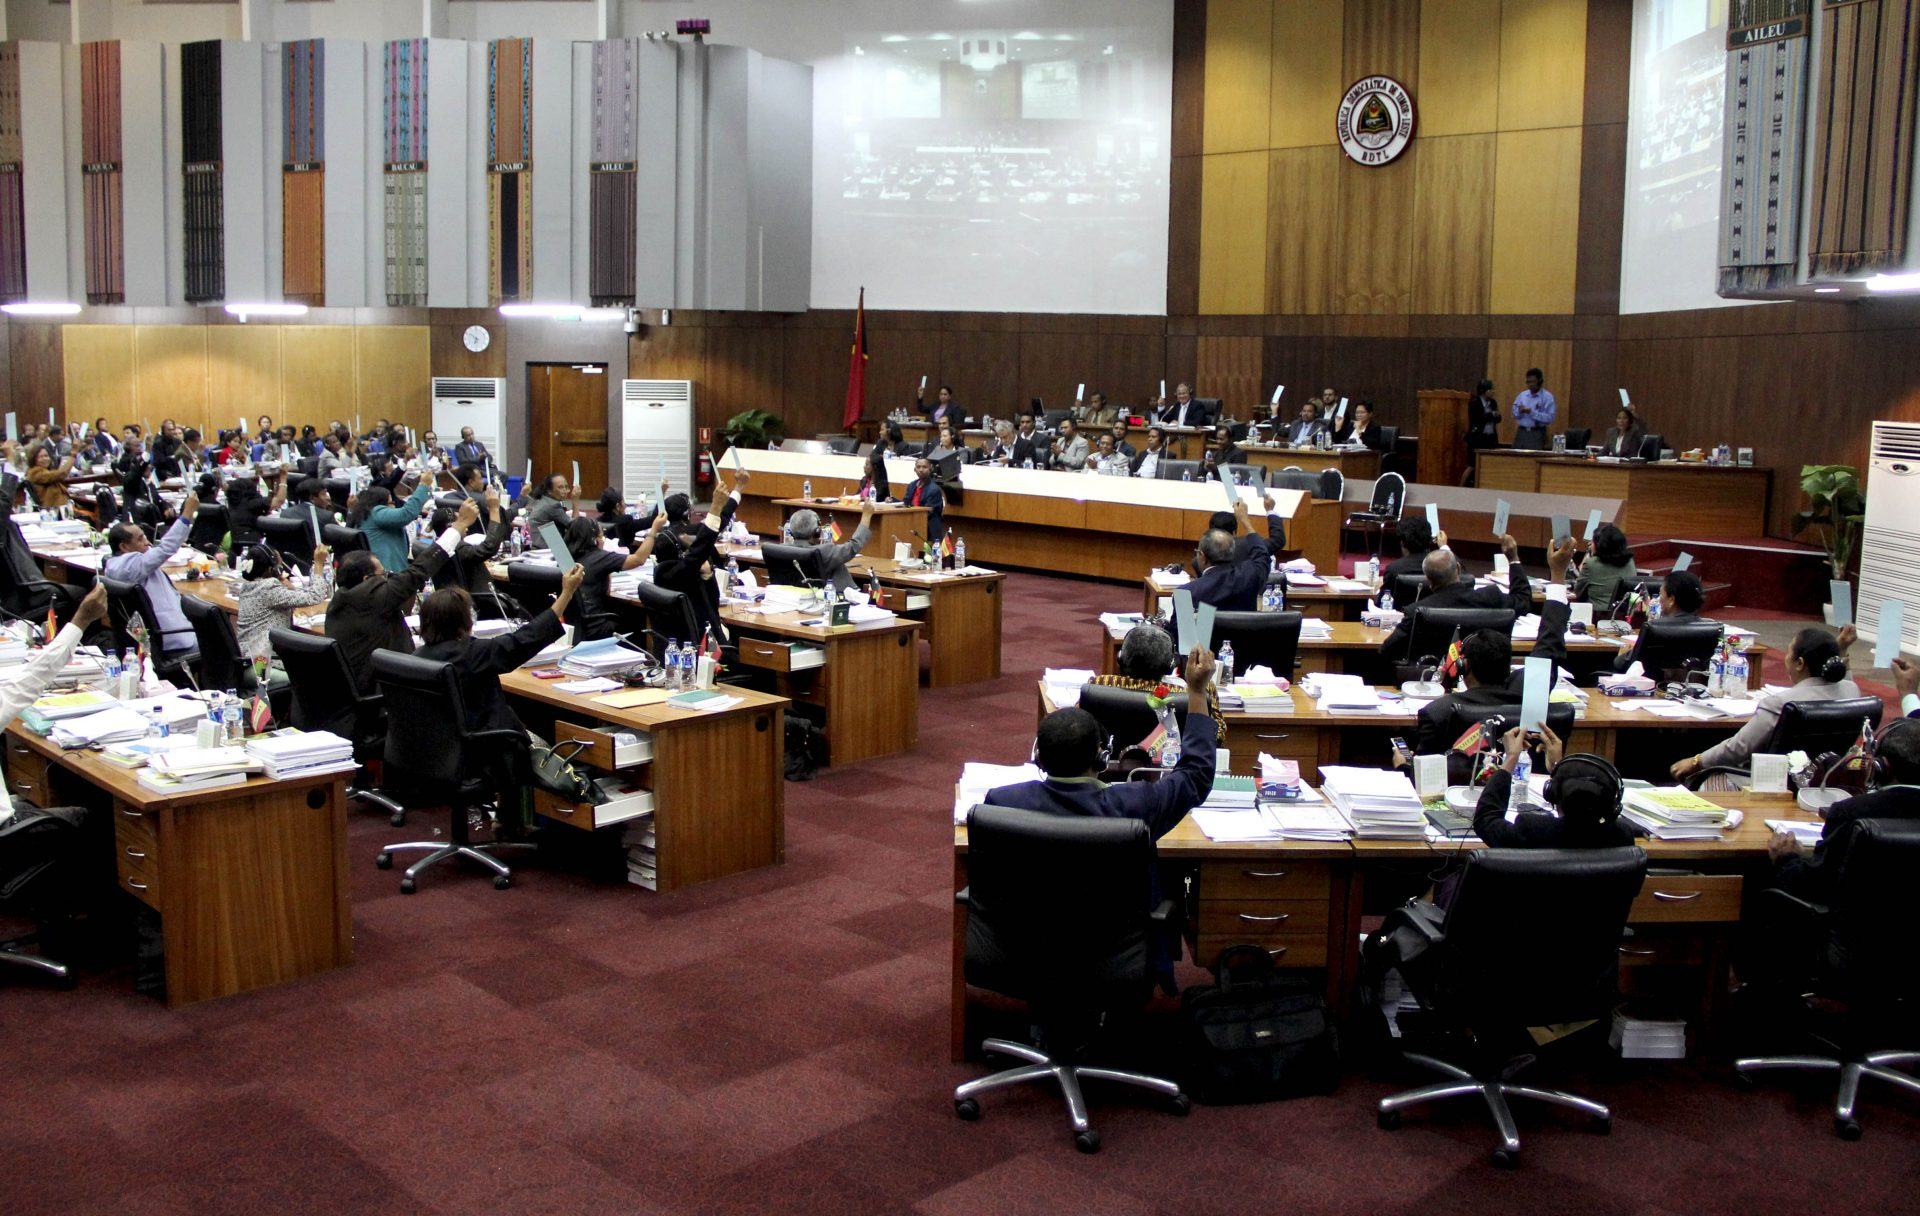 Legis-PALOP chega a Timor-Leste